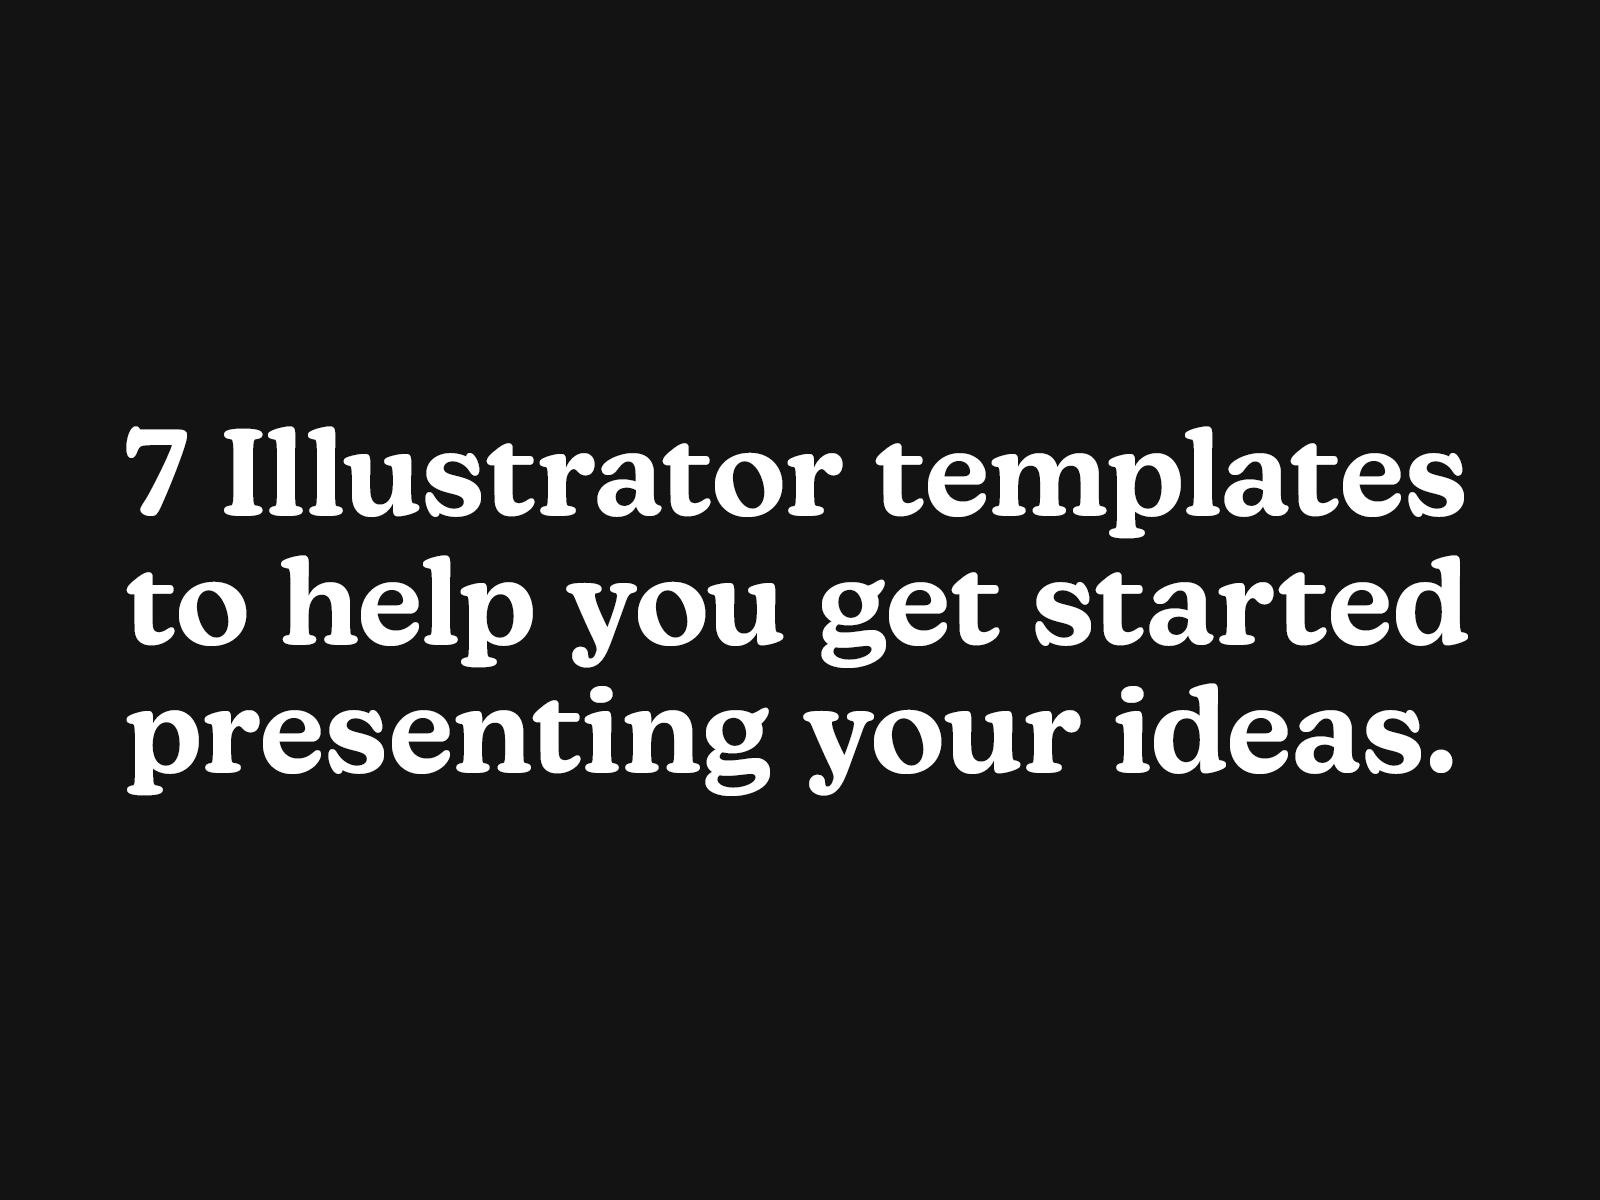 Style Guide & Presentation Starter Pack